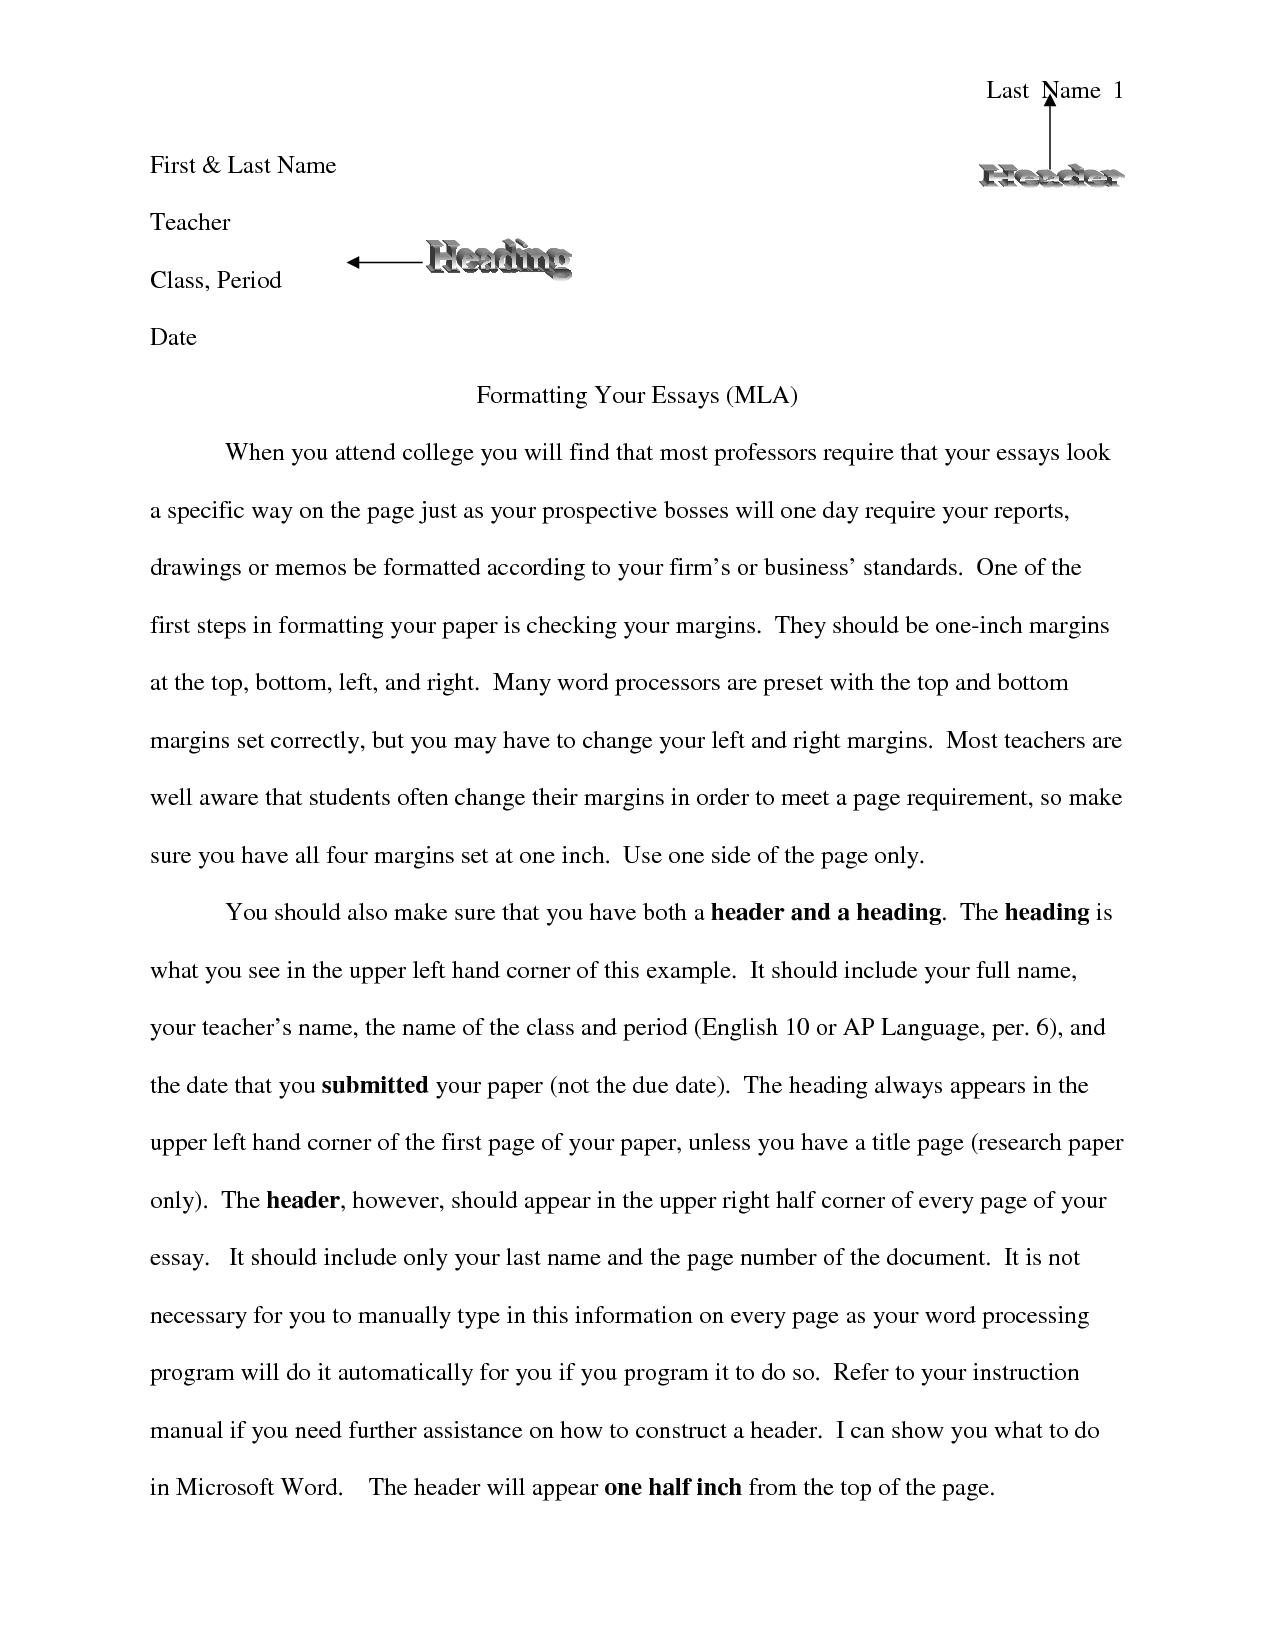 008 Essay Header Format Nnftftofsn Phenomenal Mla Paper Margins Full